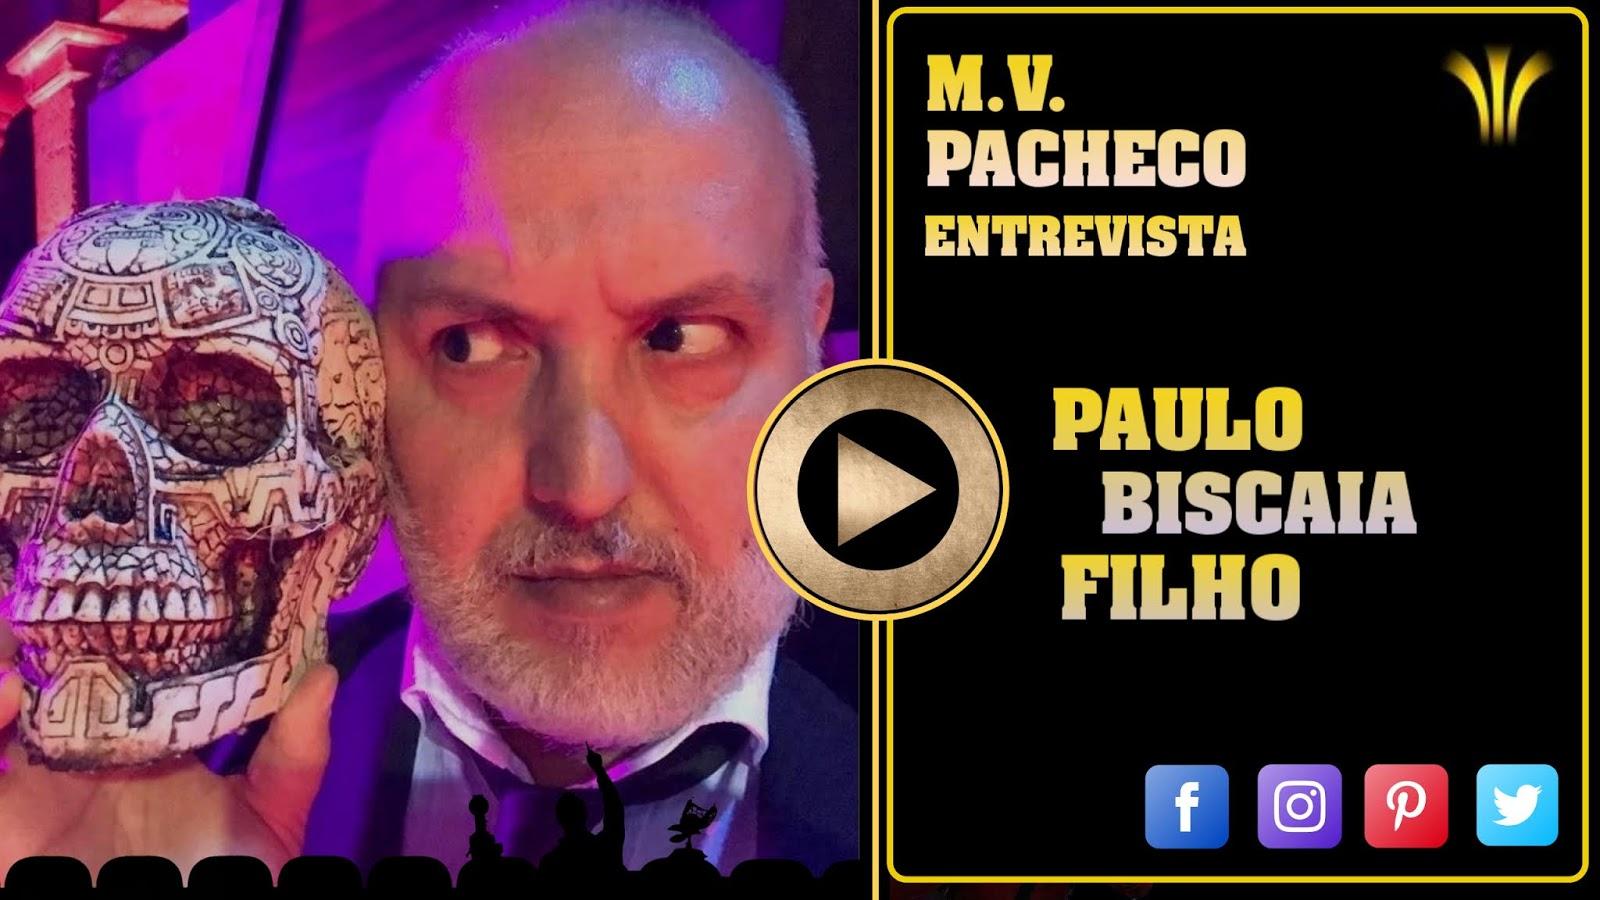 paulo-biscaia-filho-entrevista